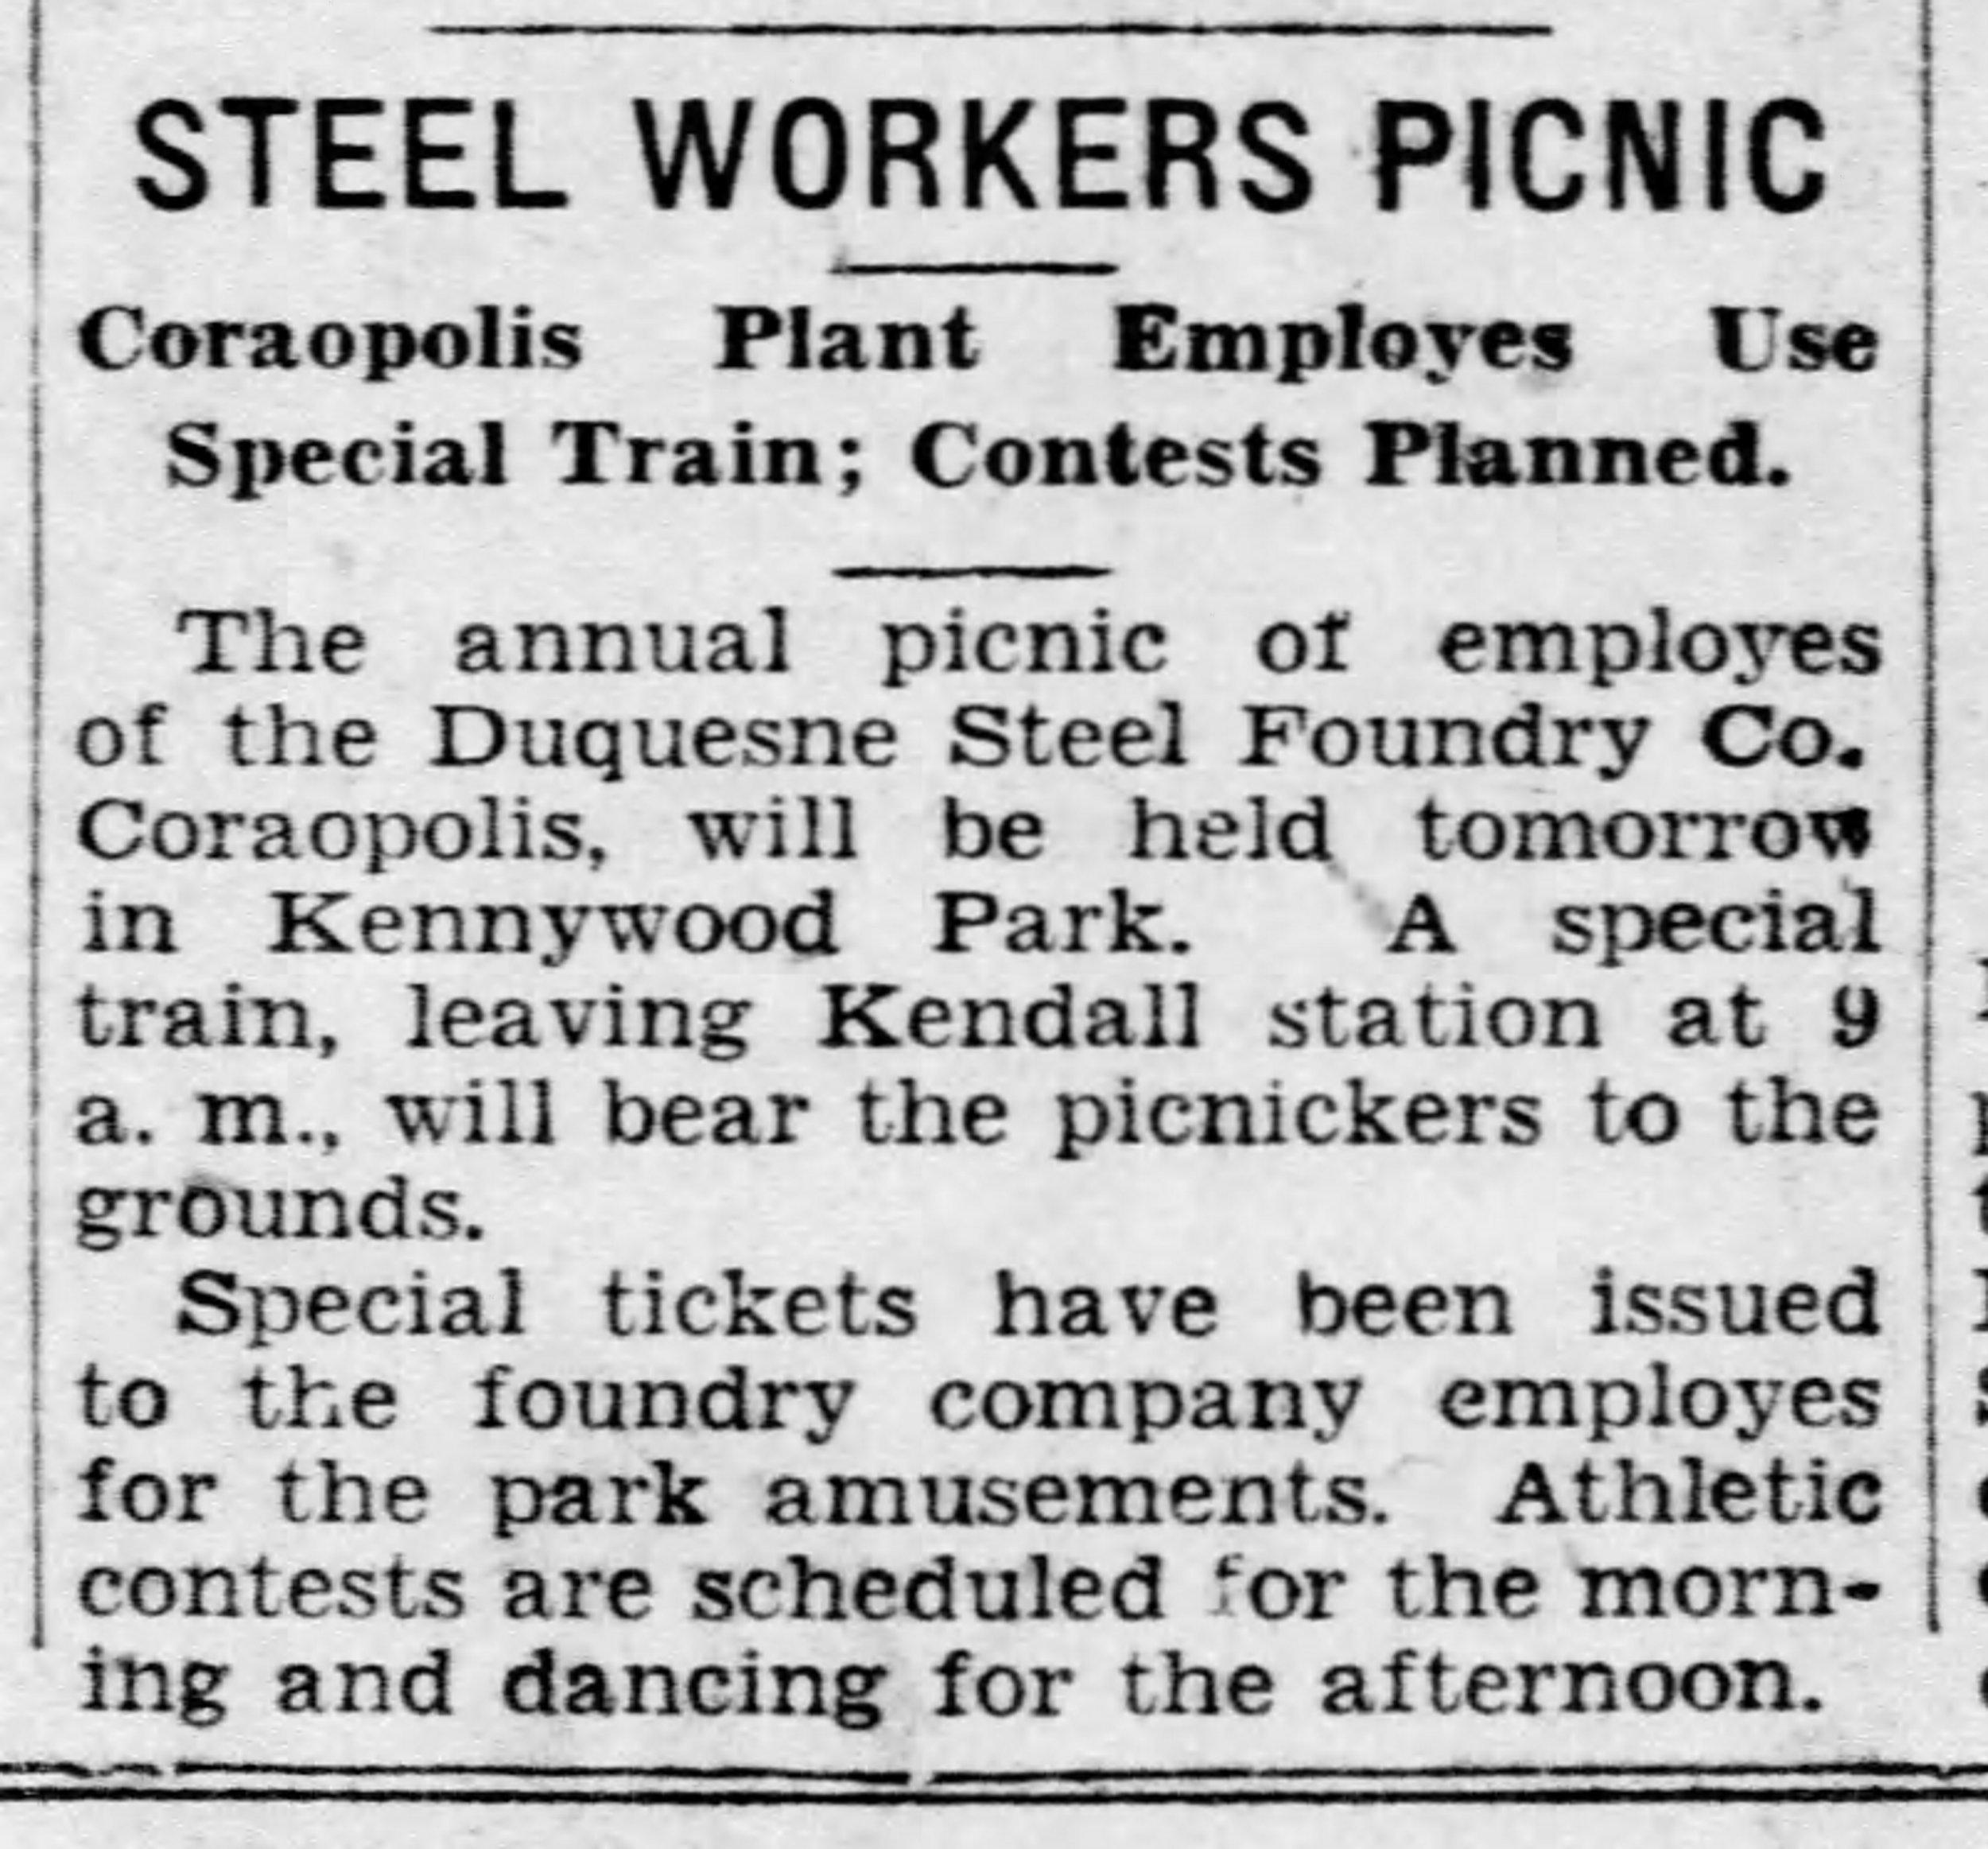 The Pittsburgh Press, June 21, 1929